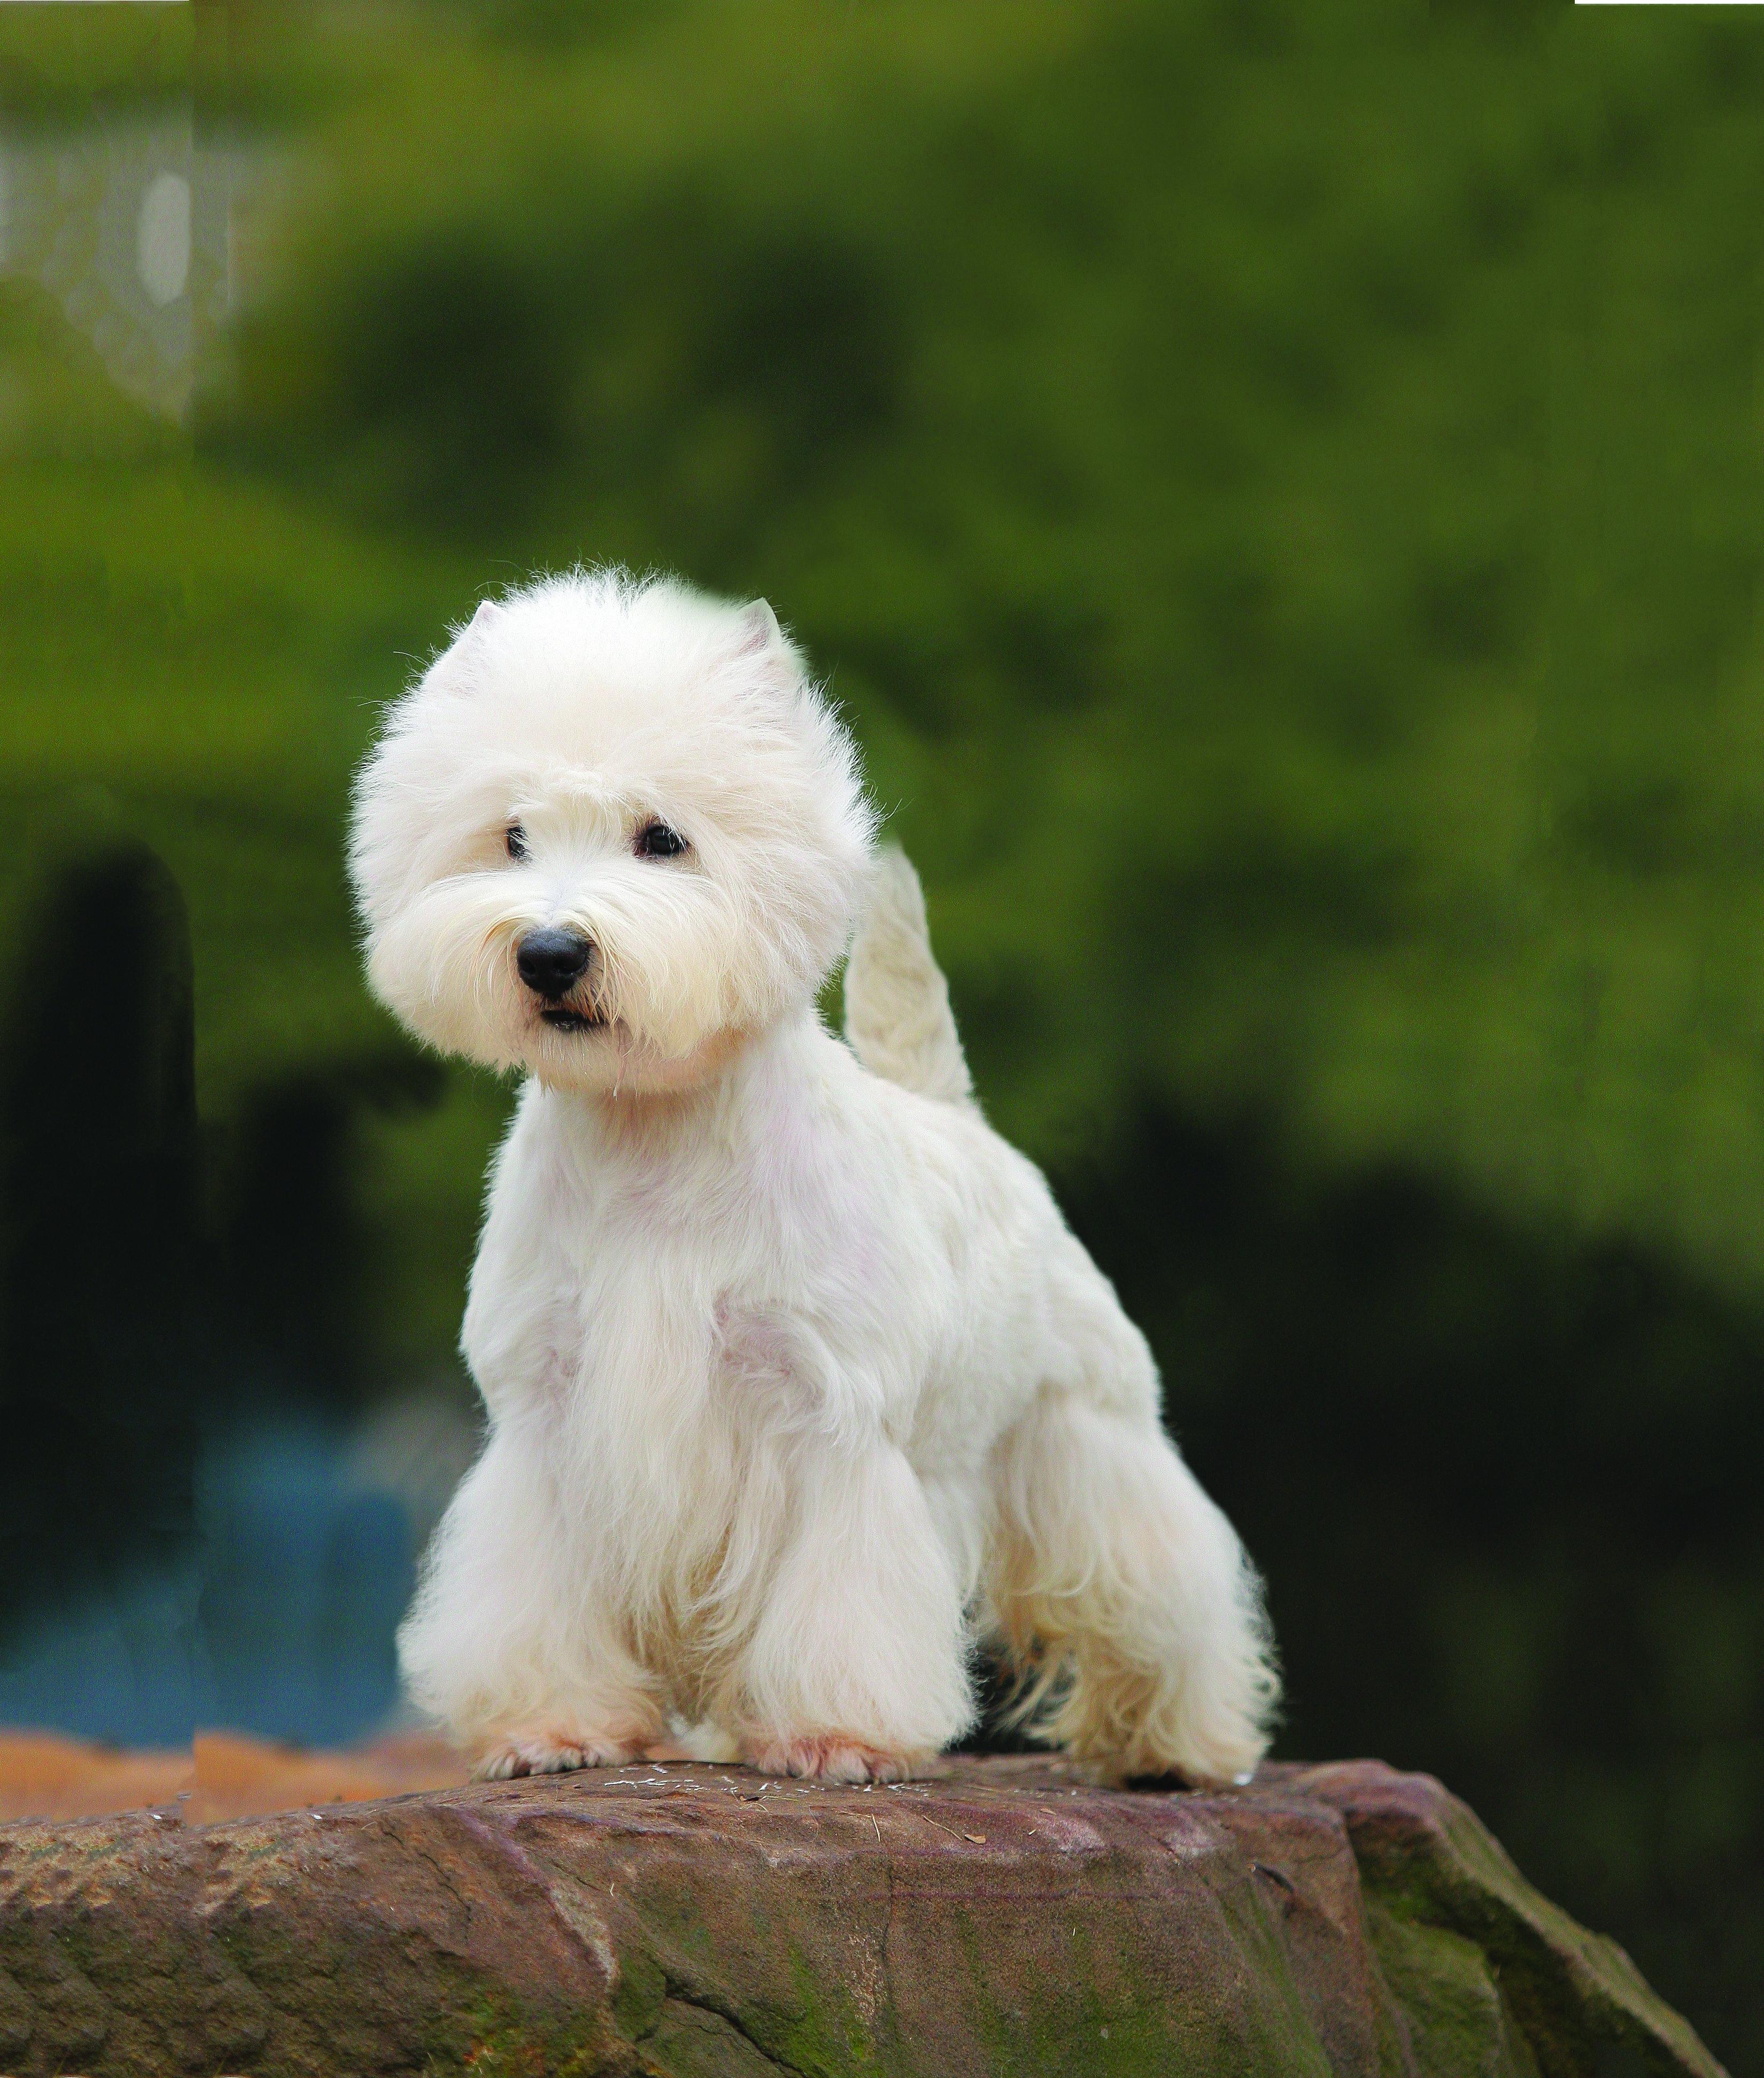 Pets for sale york pa craigslist